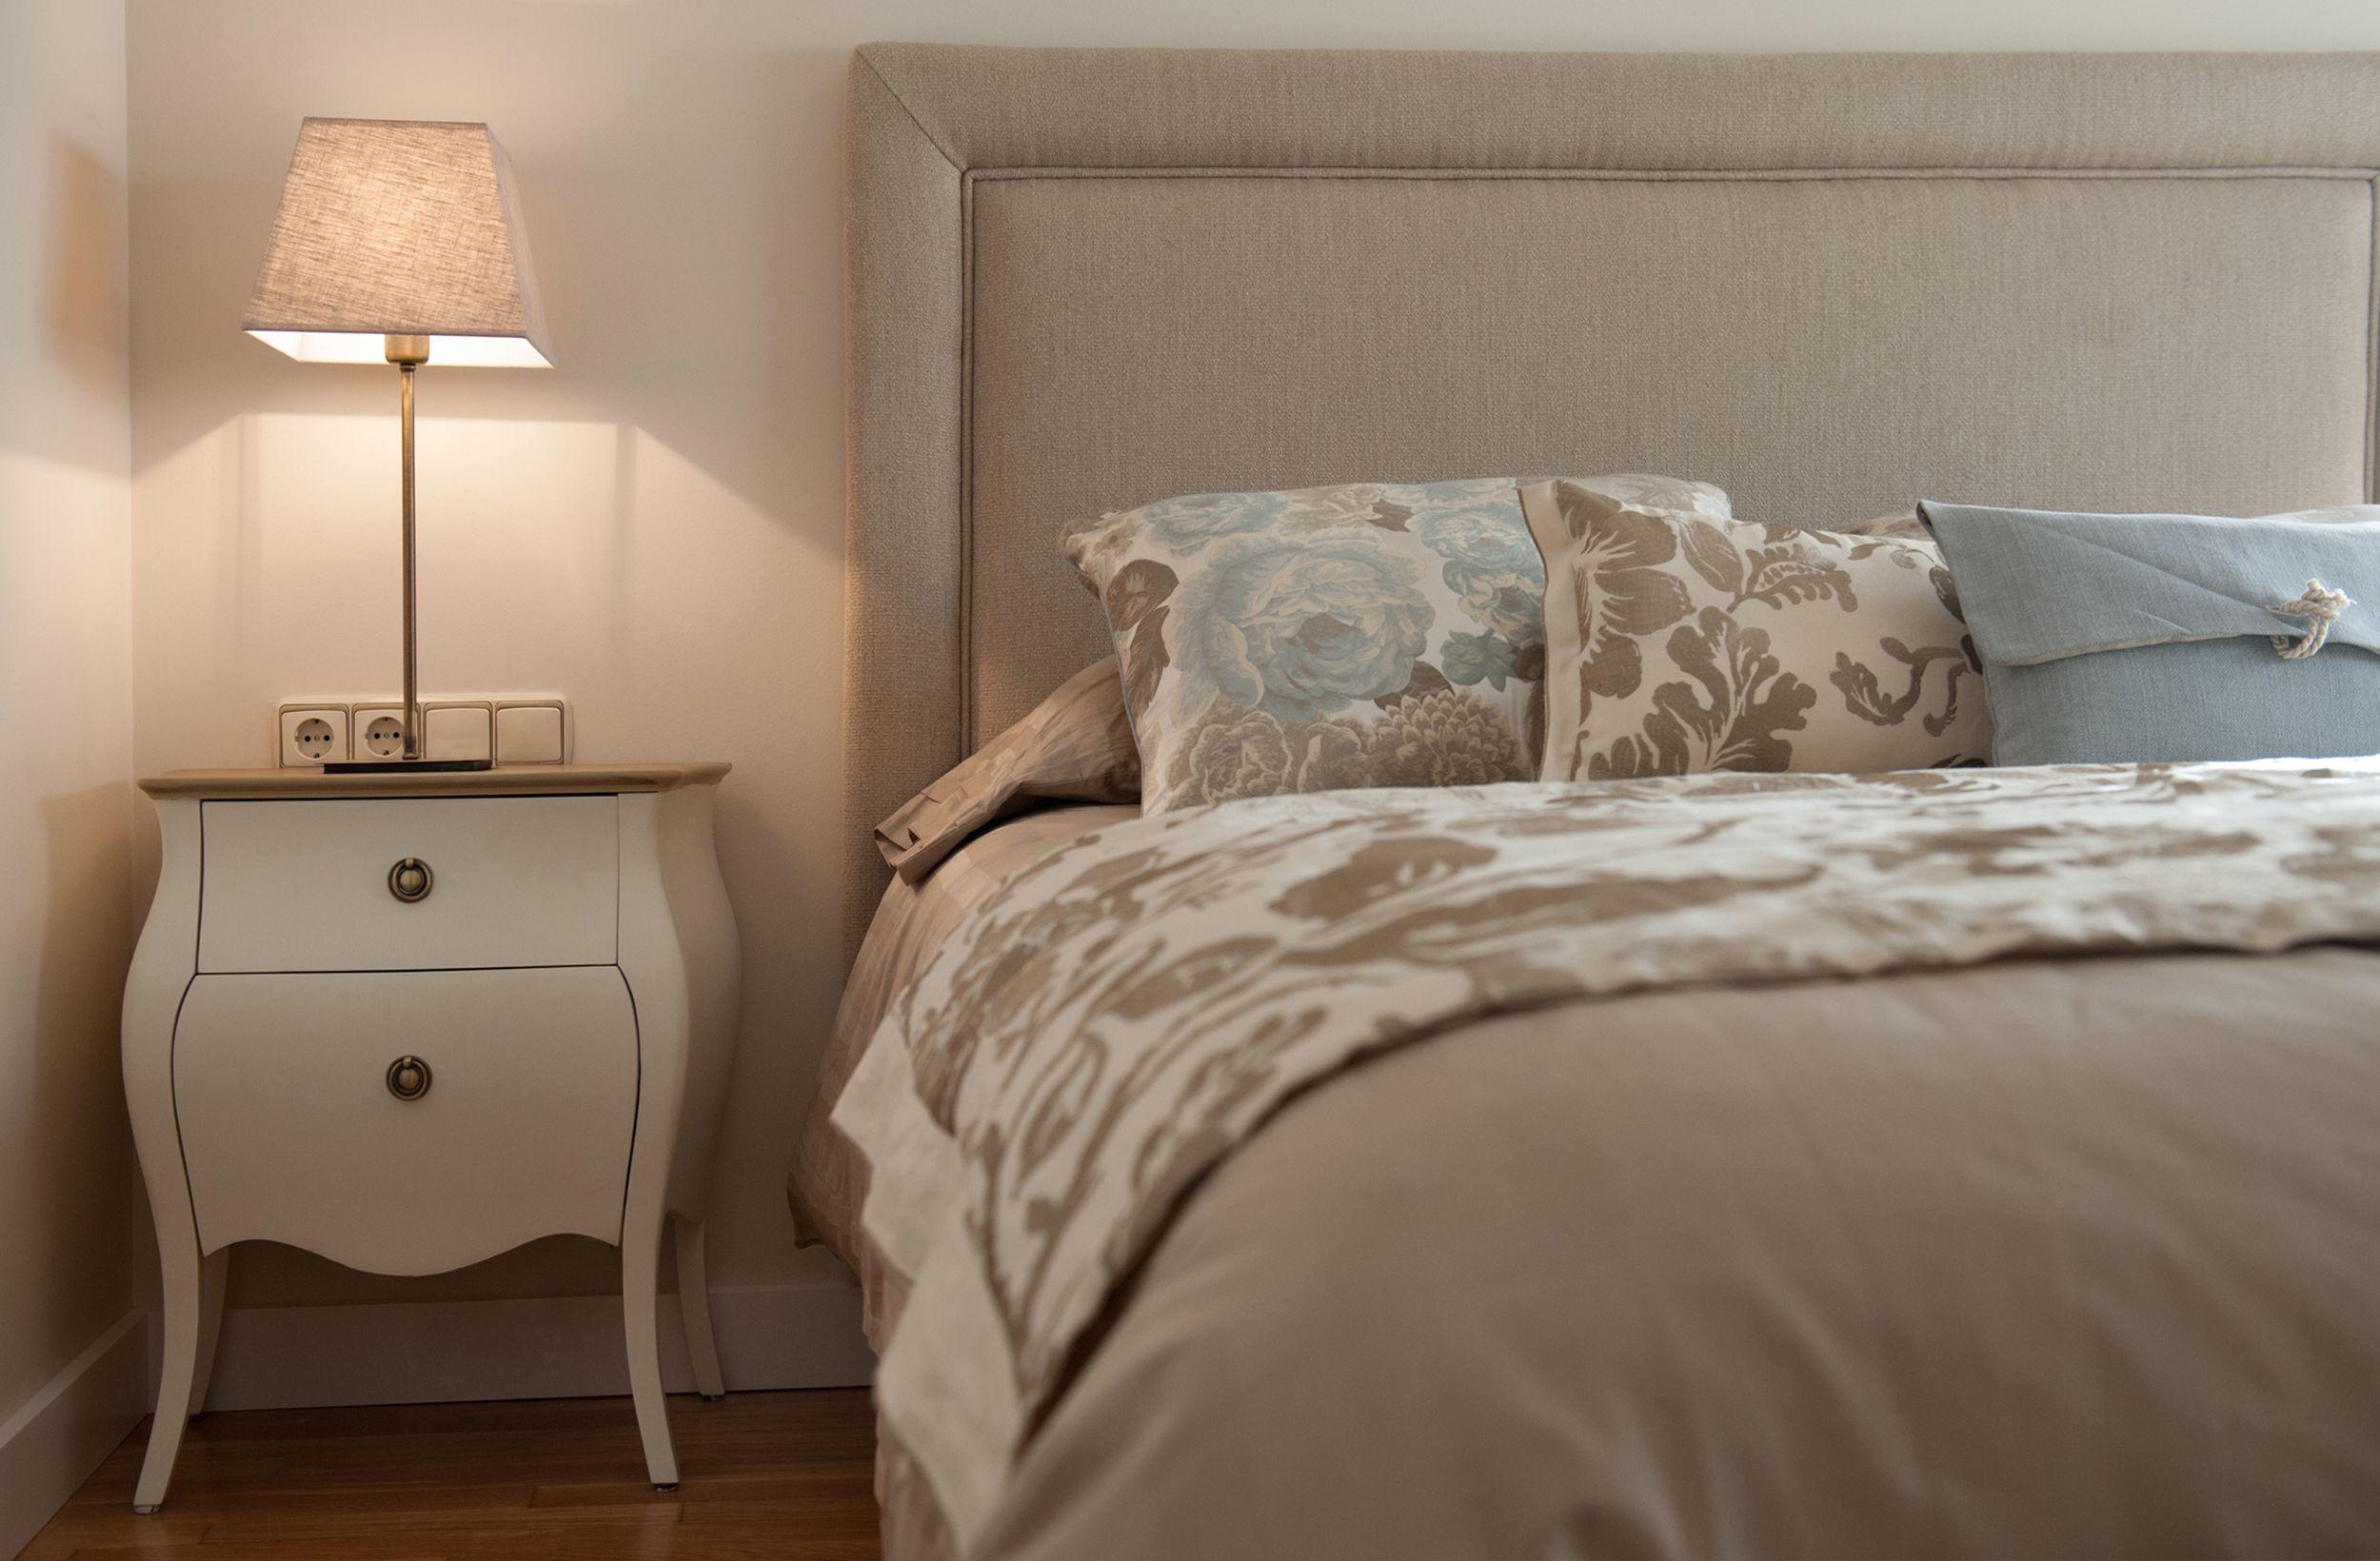 Decoracion Contemporaneo Dormitorio Camas Comodas Lamparas  ~ Adornos Para Comodas De Dormitorio